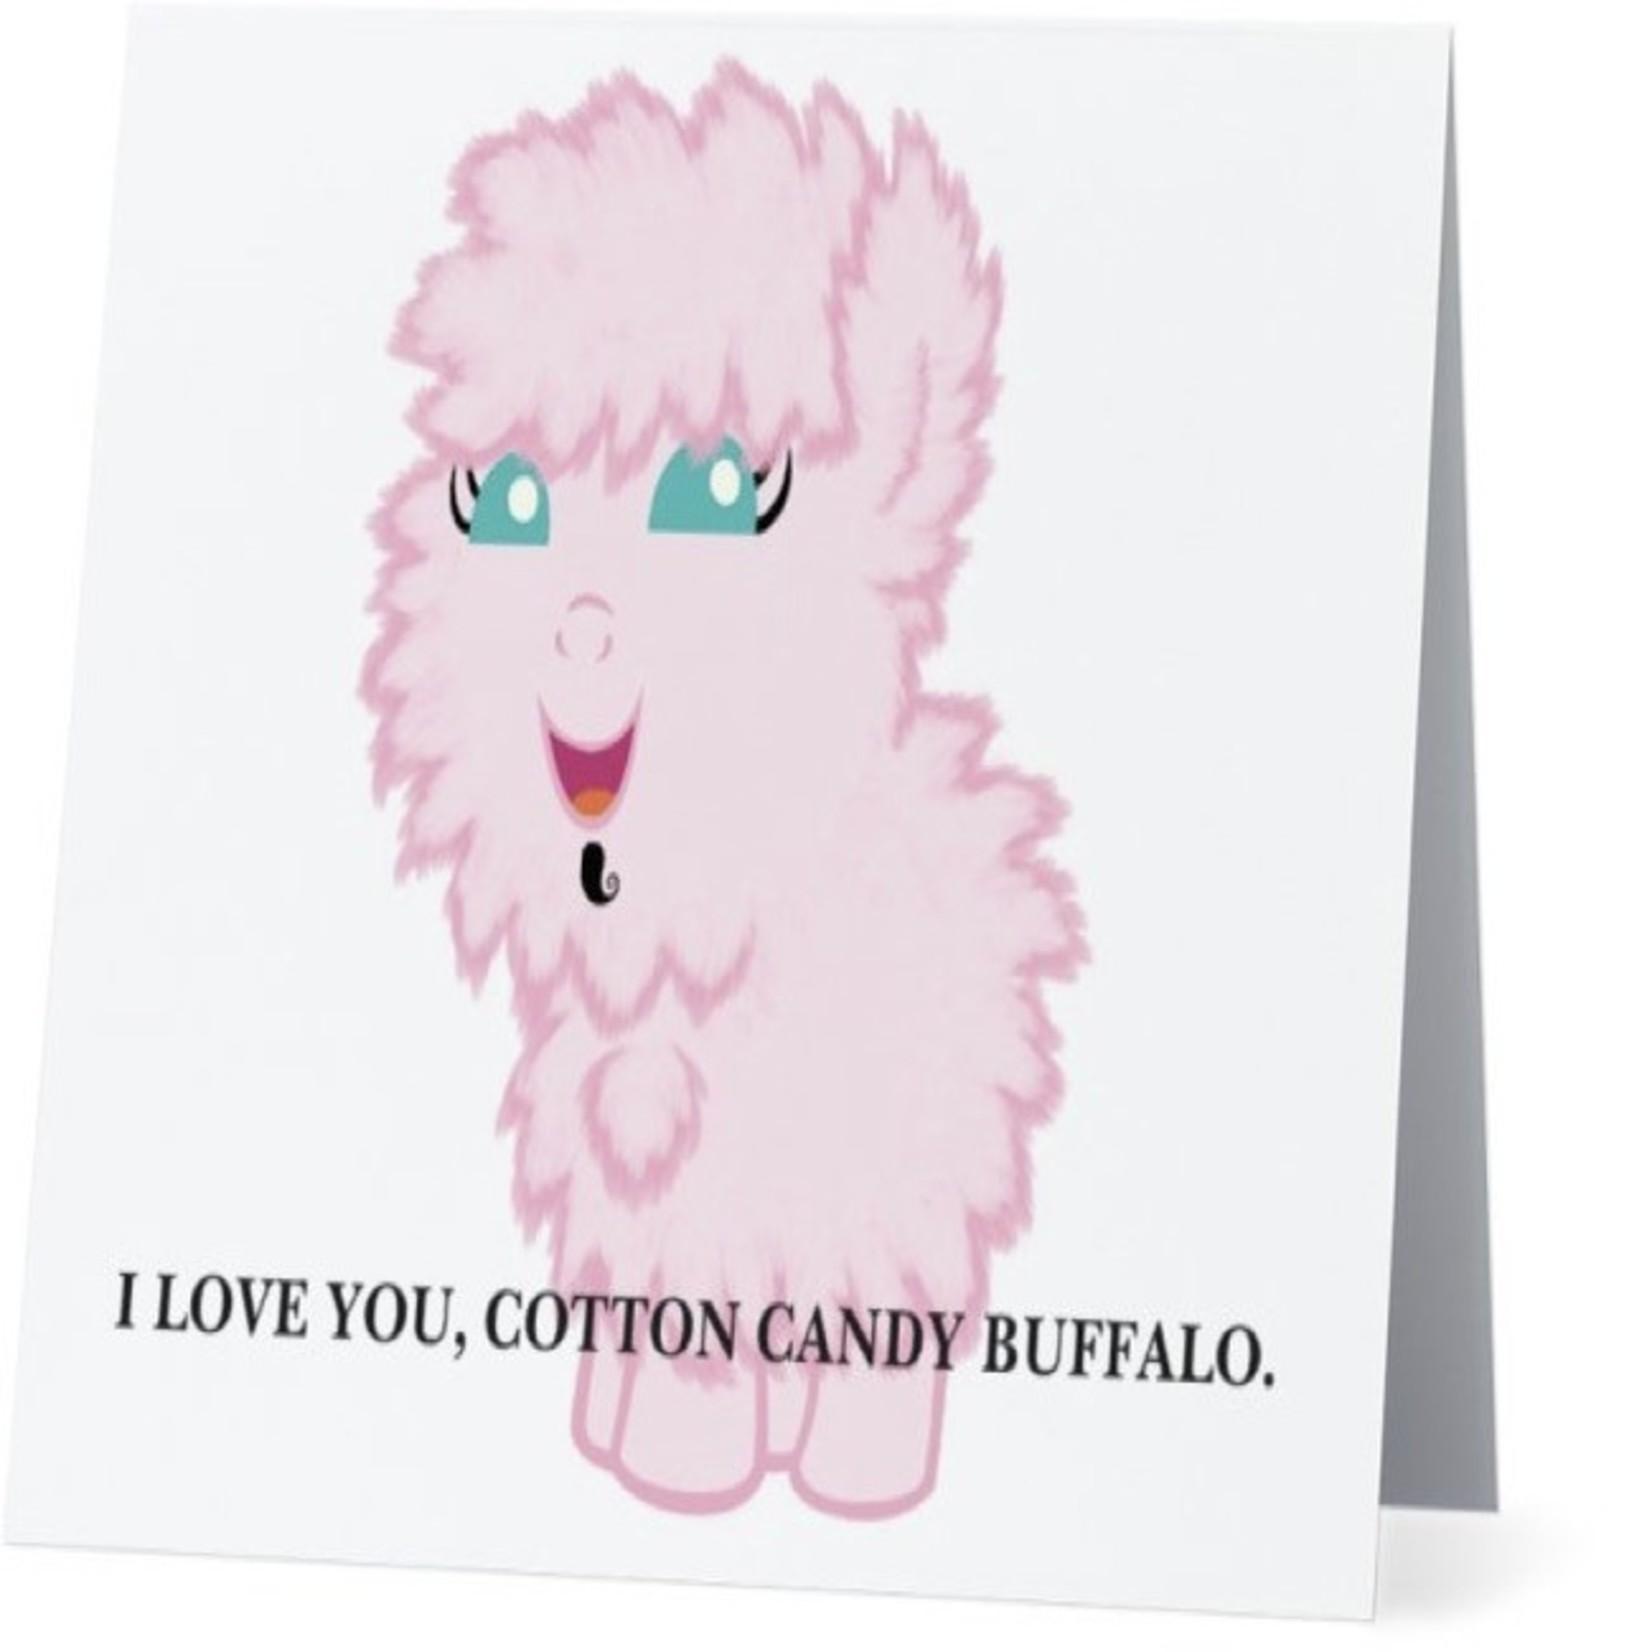 Bad Annie's Card #008 - I Love You Cotton Candy Buffalo